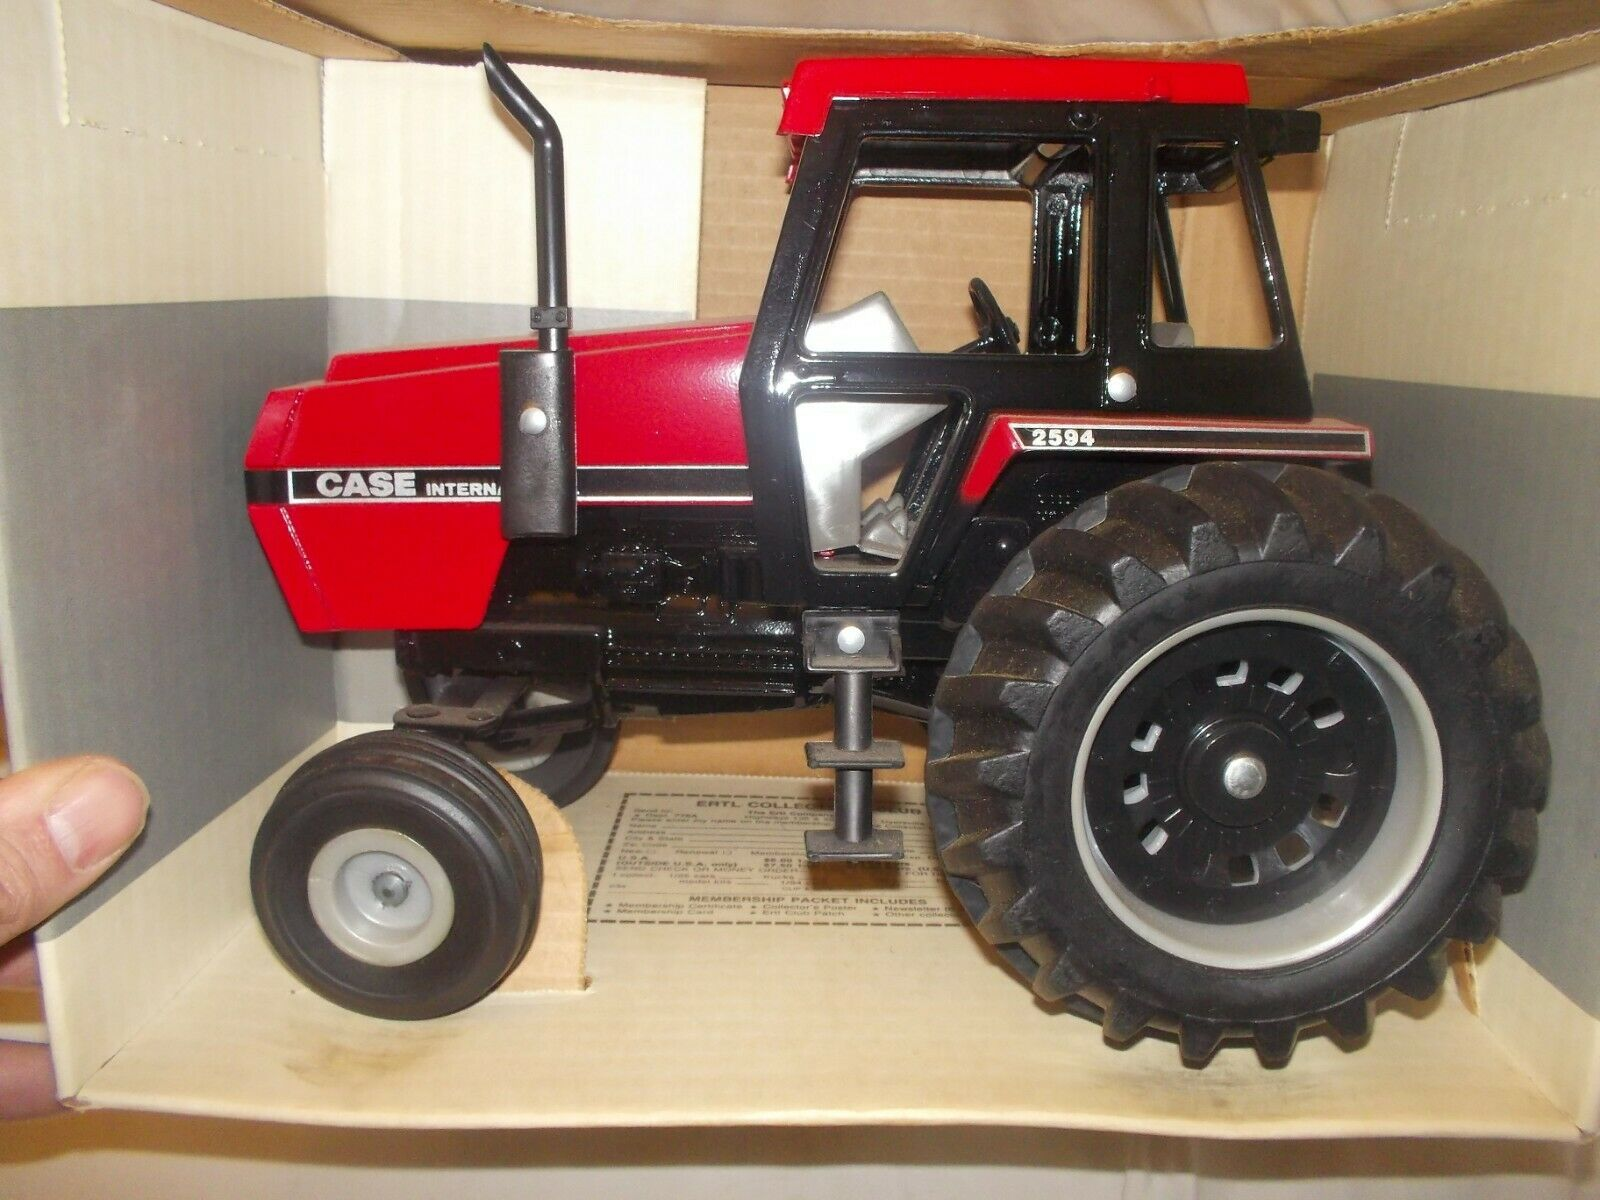 Case International IH 2594 rosso Cab toy tractor 1 16 scale NIB box 600